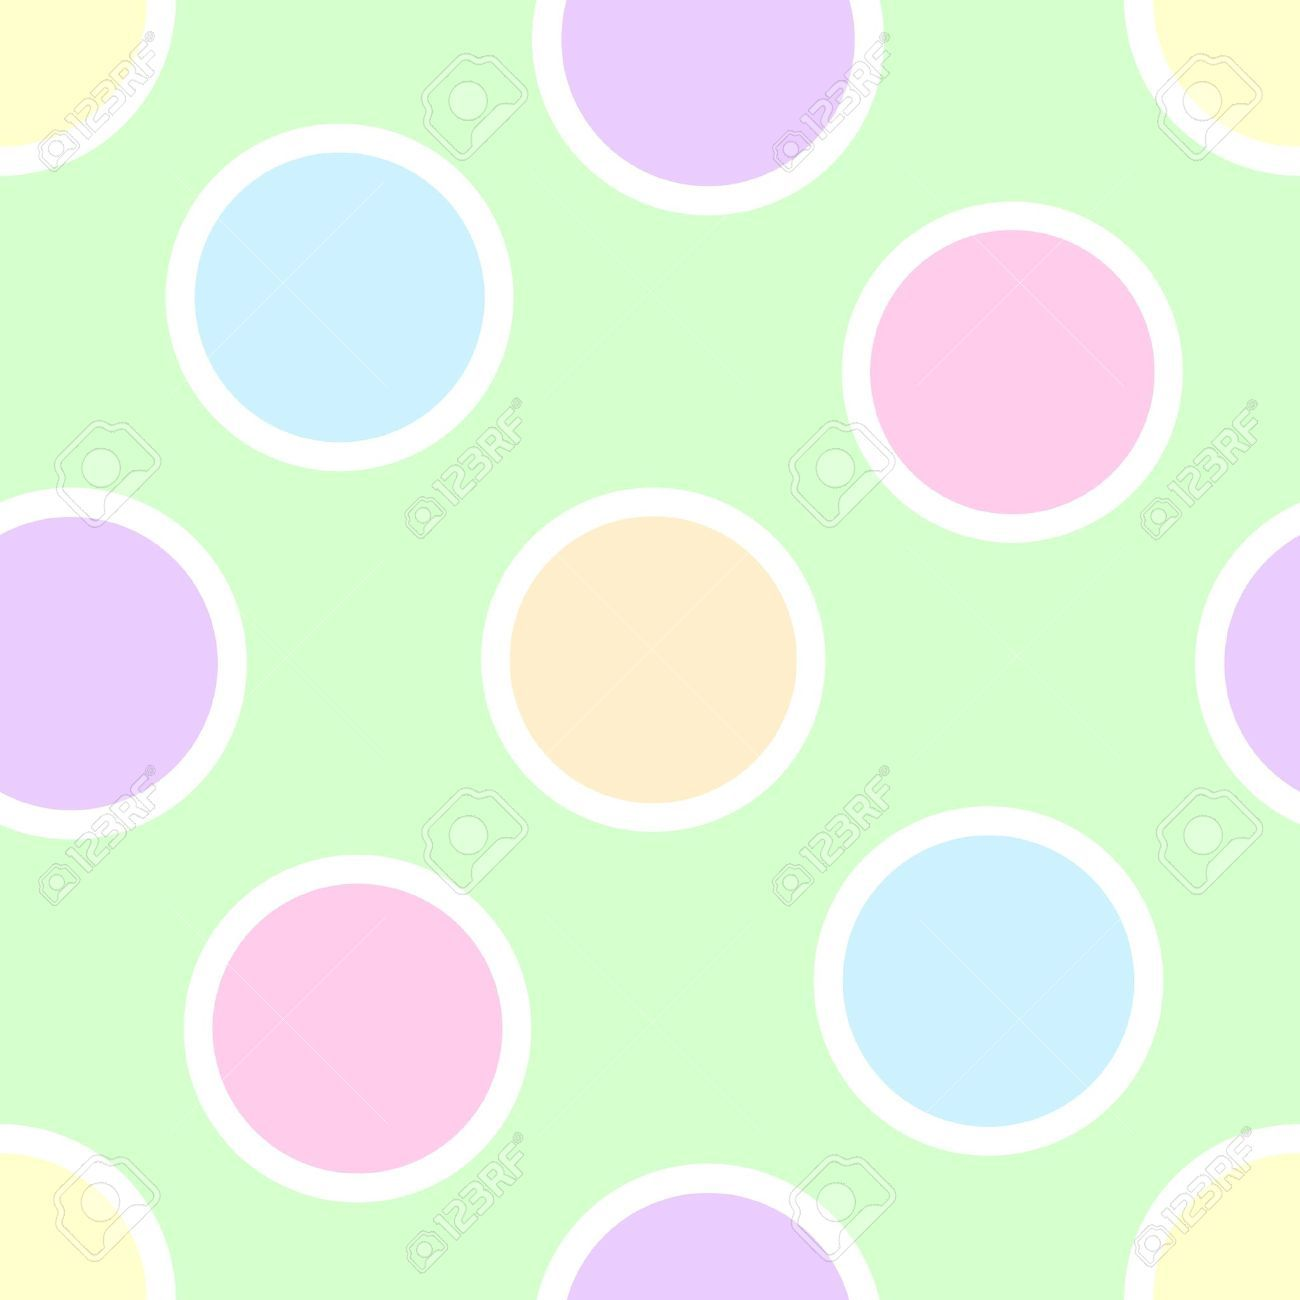 Pastel Rainbow Polka Dot Background Google Search Polka Dots Wallpaper Rainbow Polka Dots Polka Dot Background